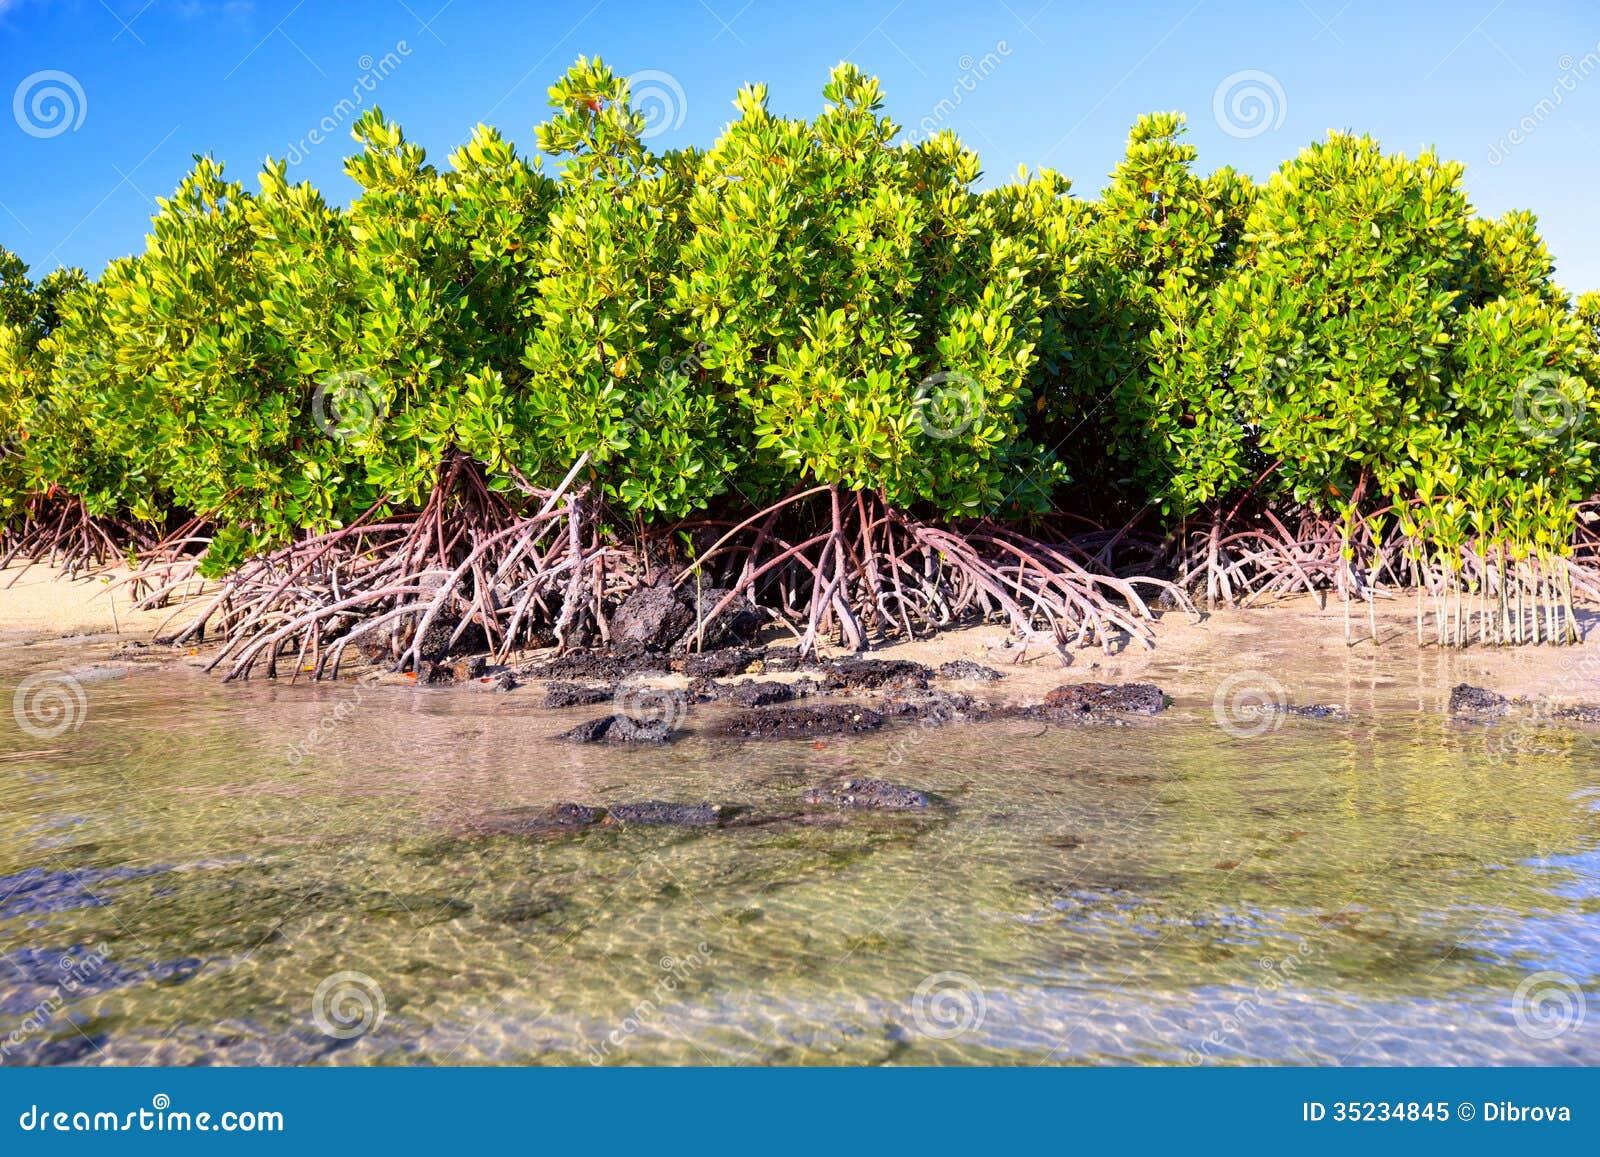 Mangrovenanlagen